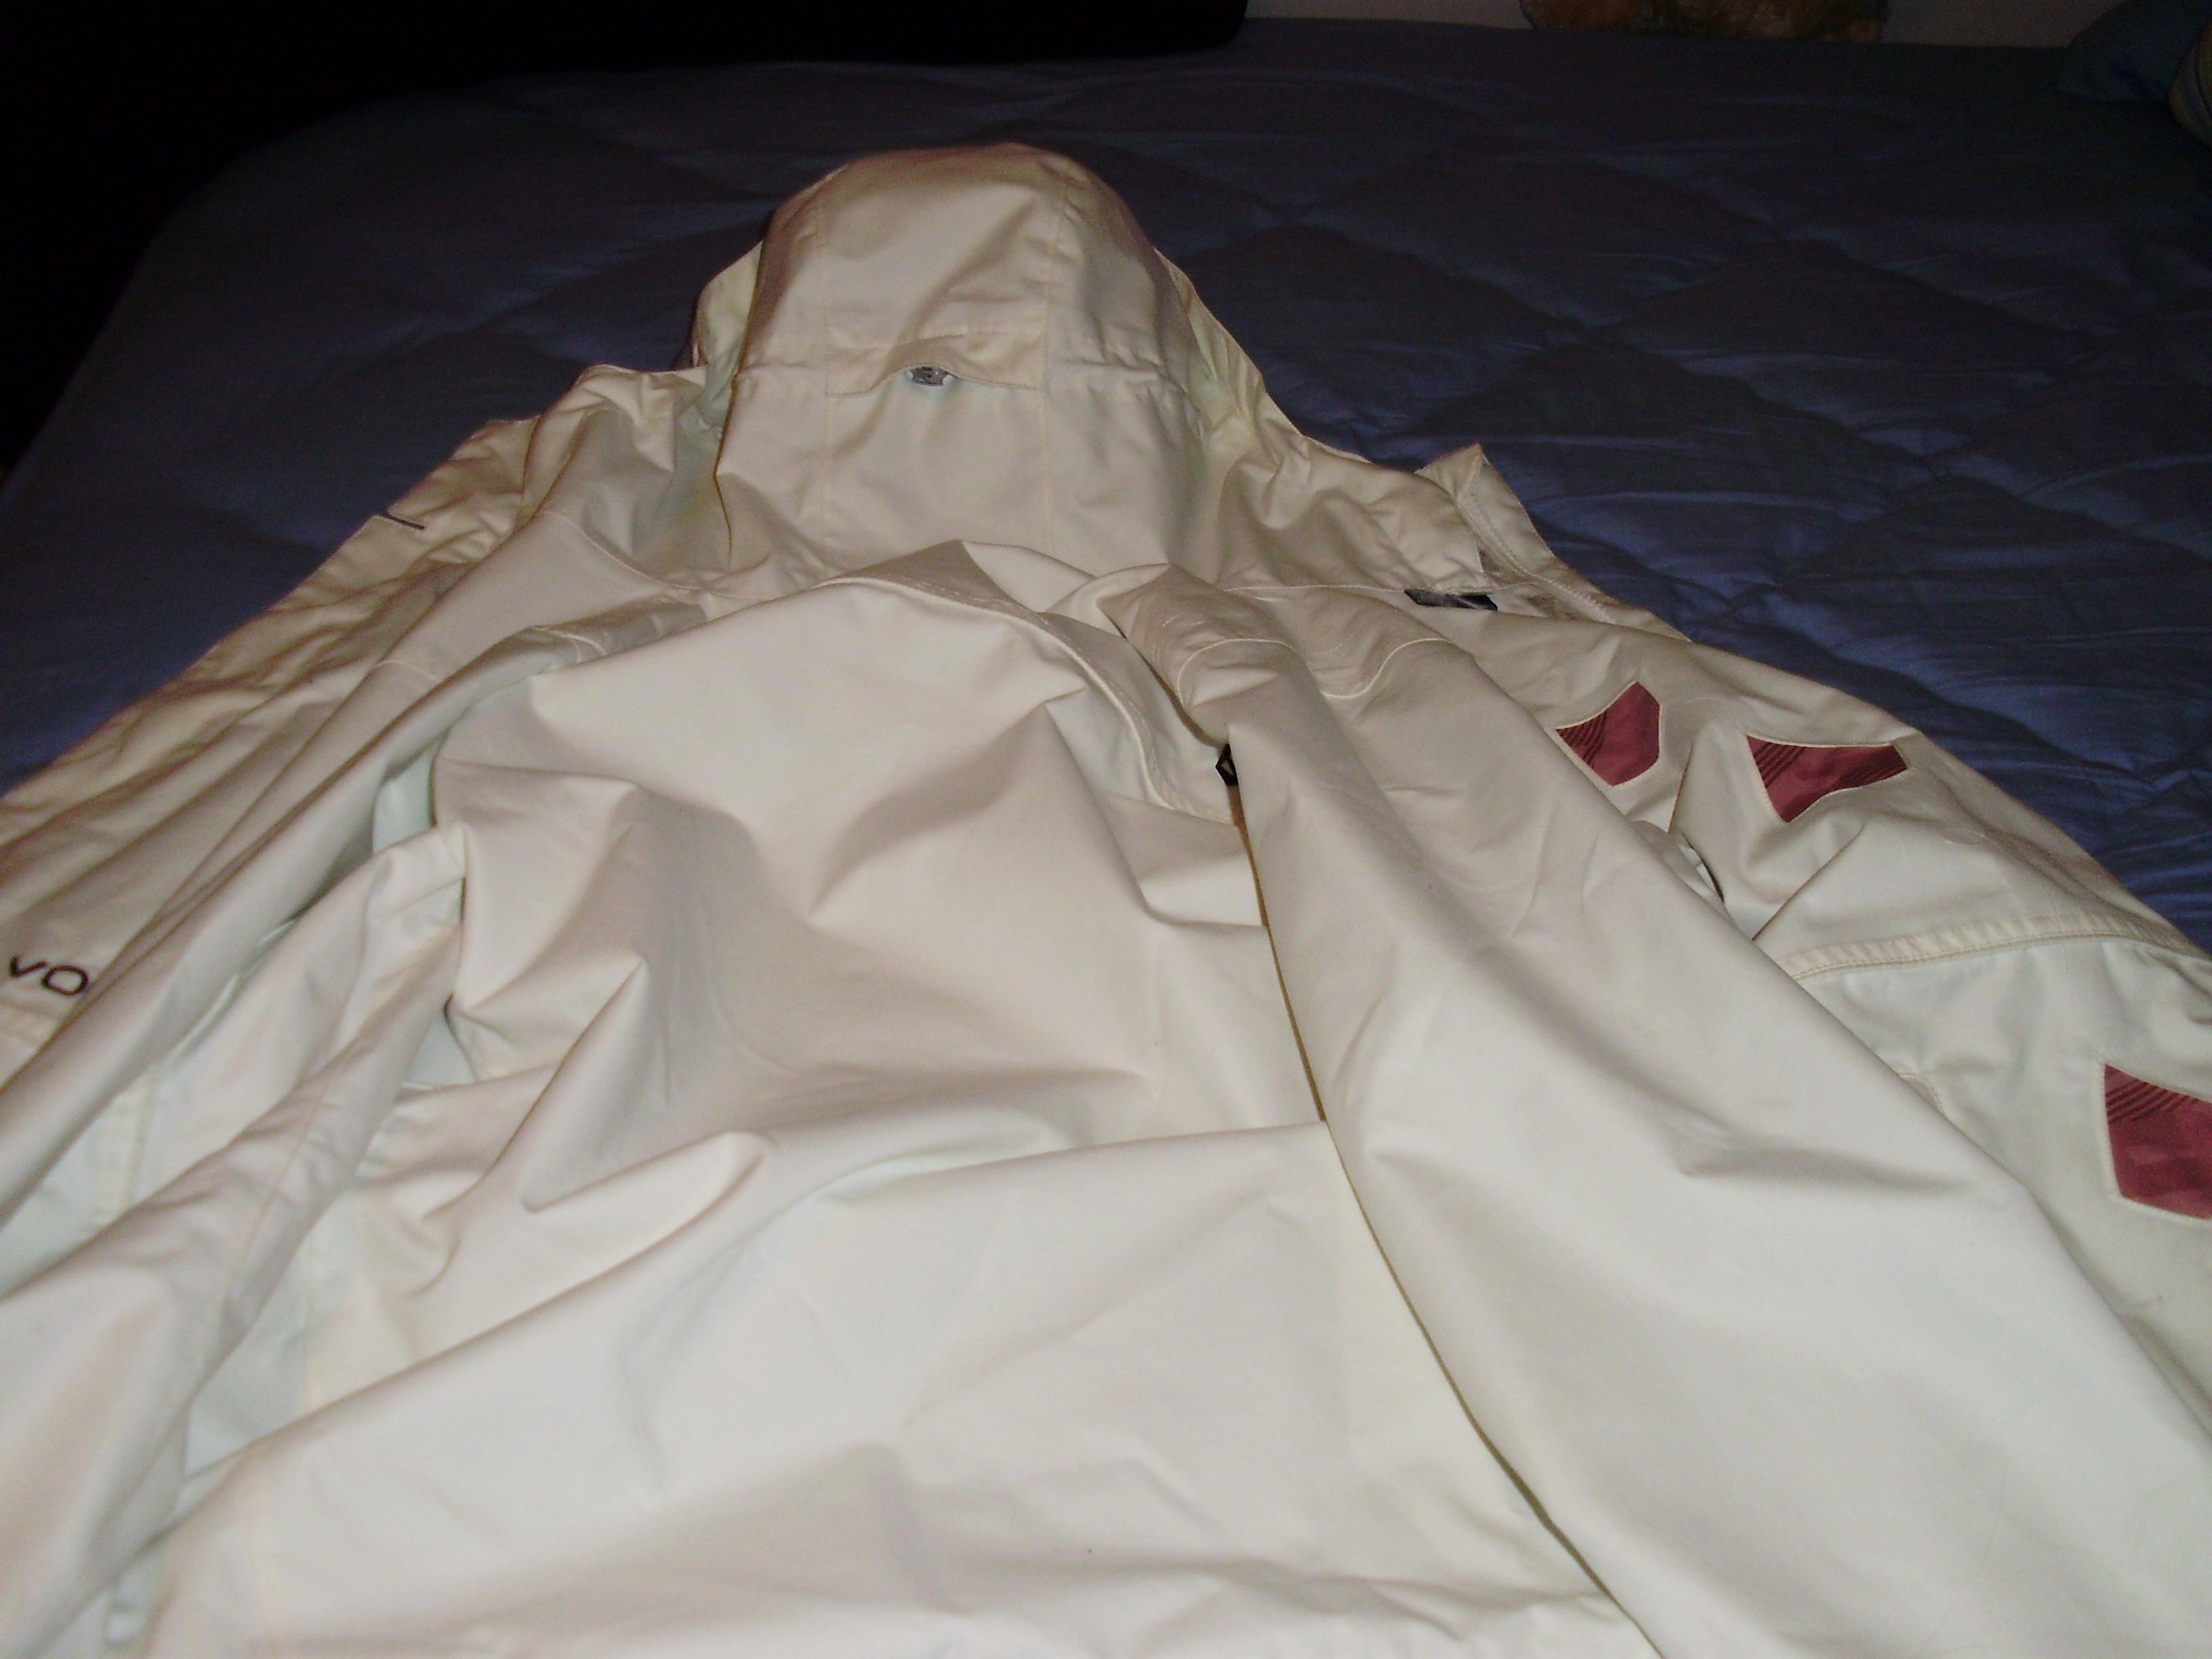 Volcom coat back view